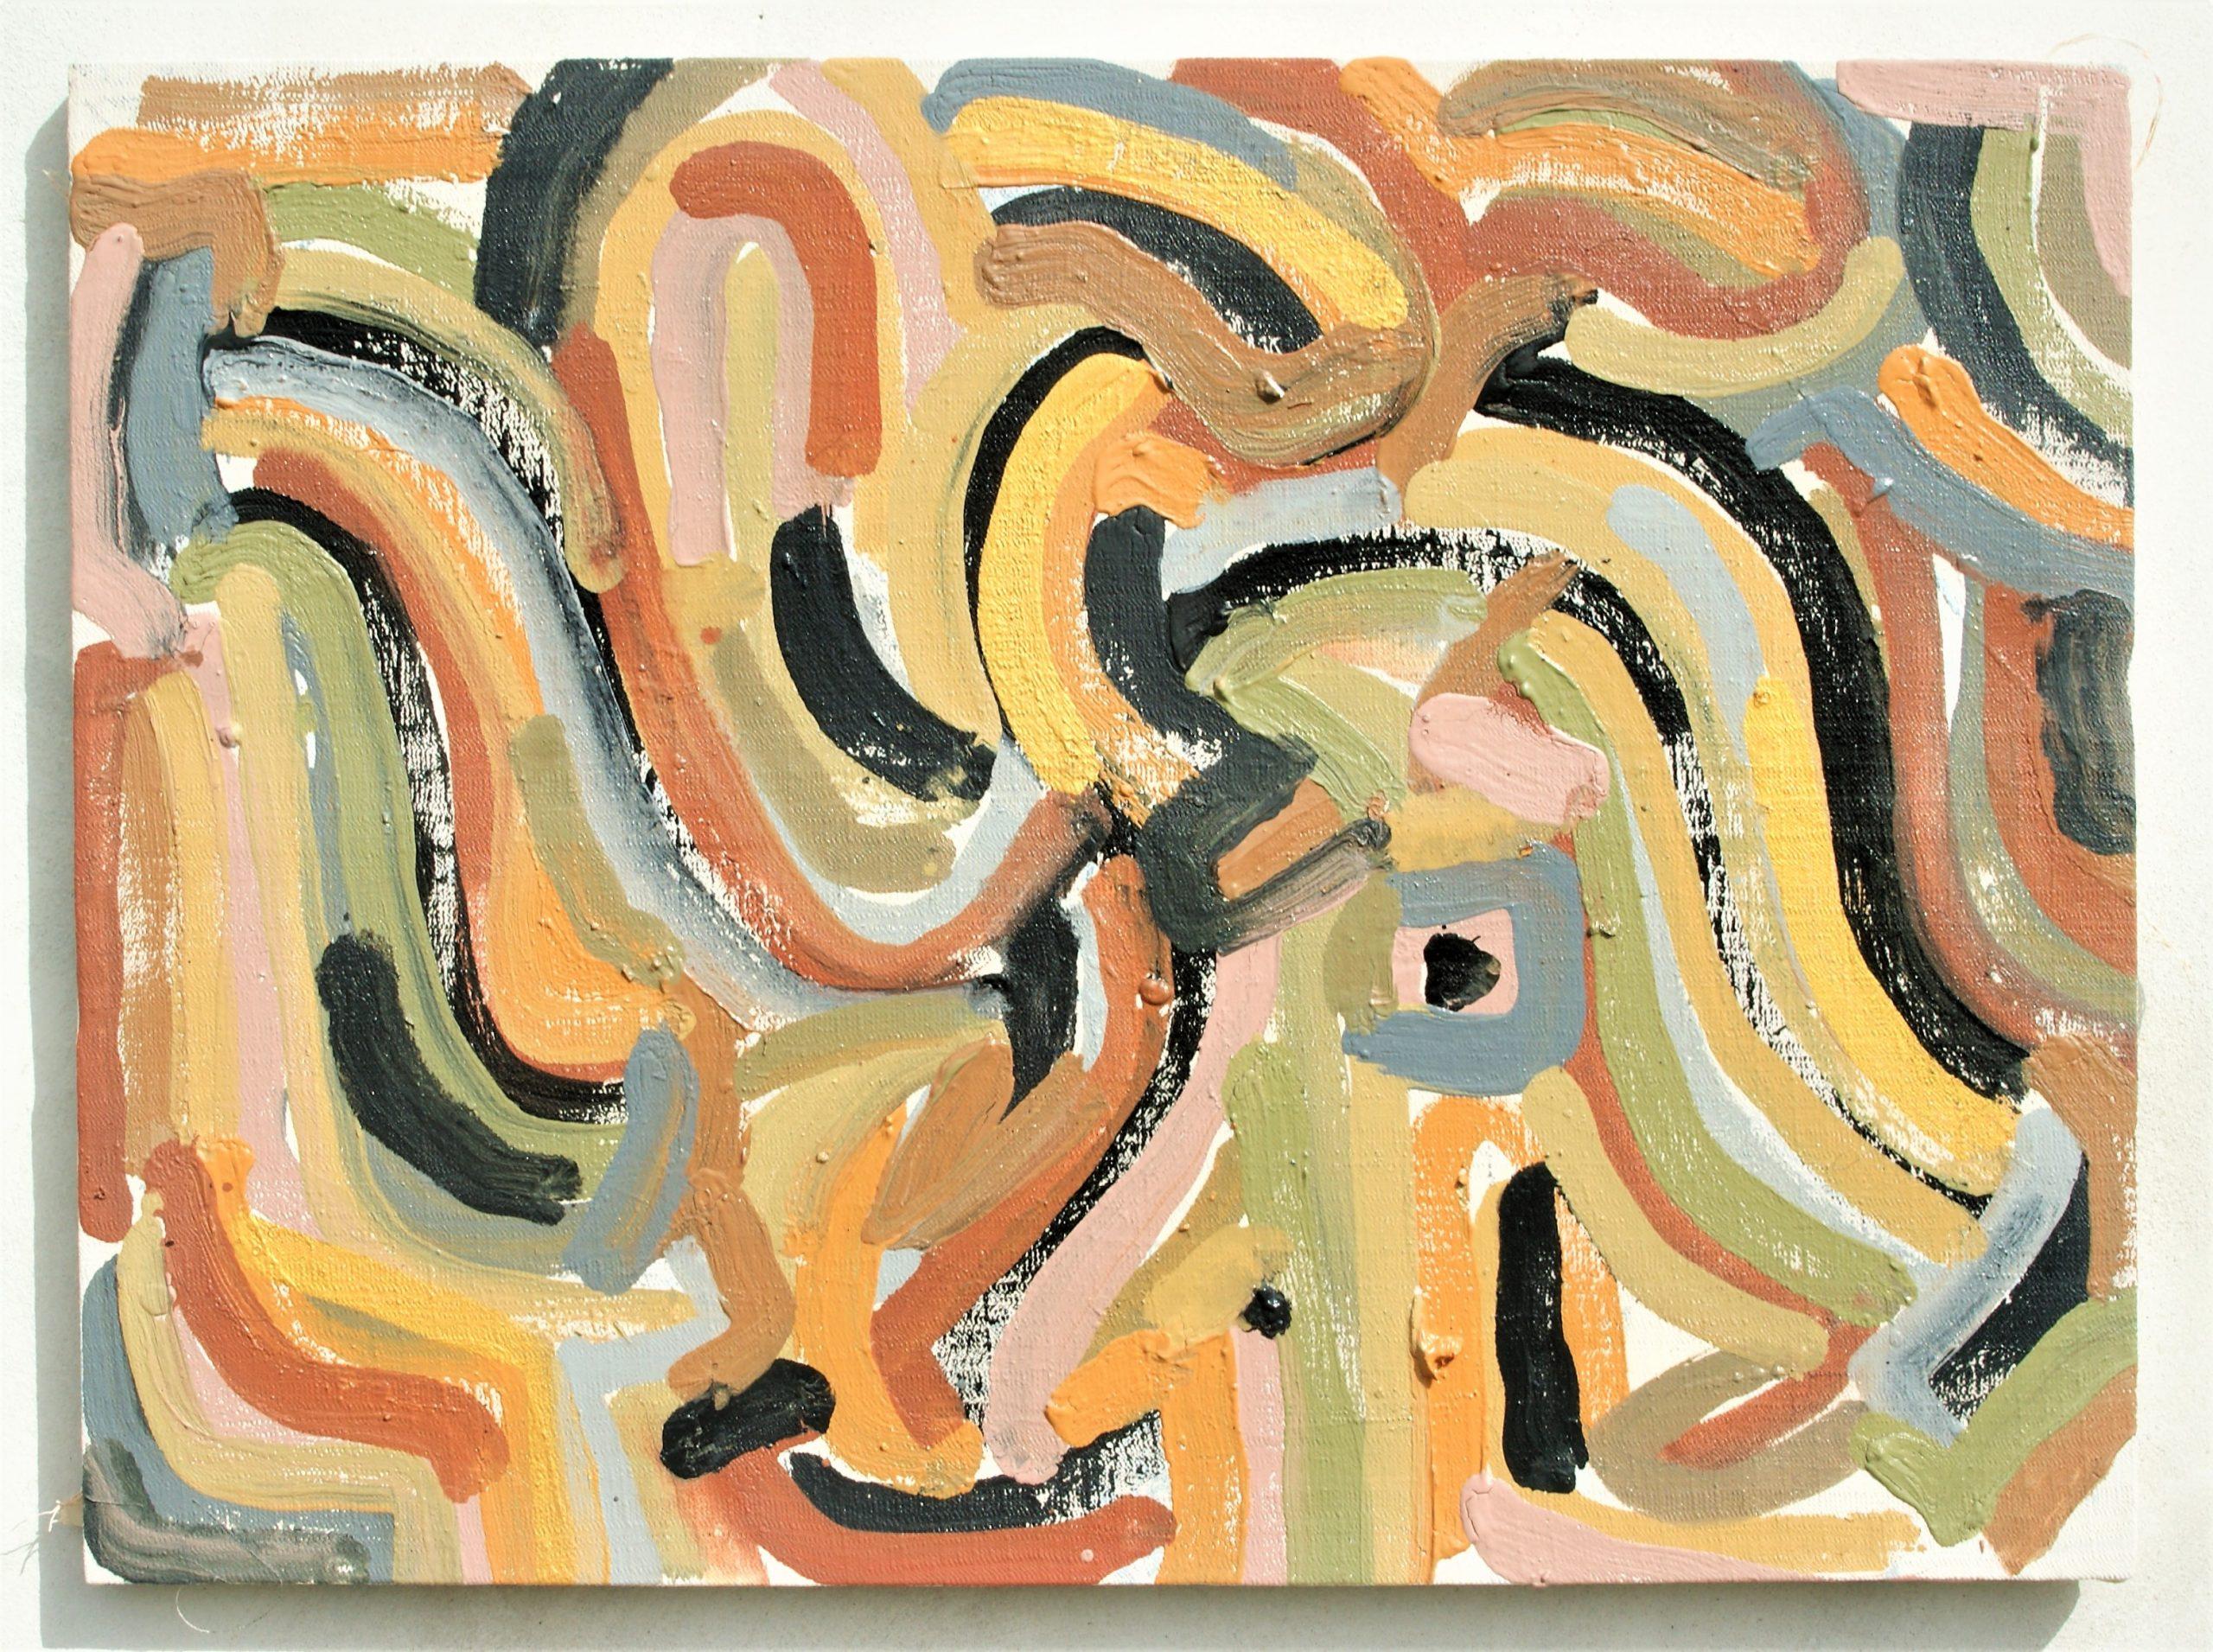 Marmo Scontato - Acrylic 67/50 cm.